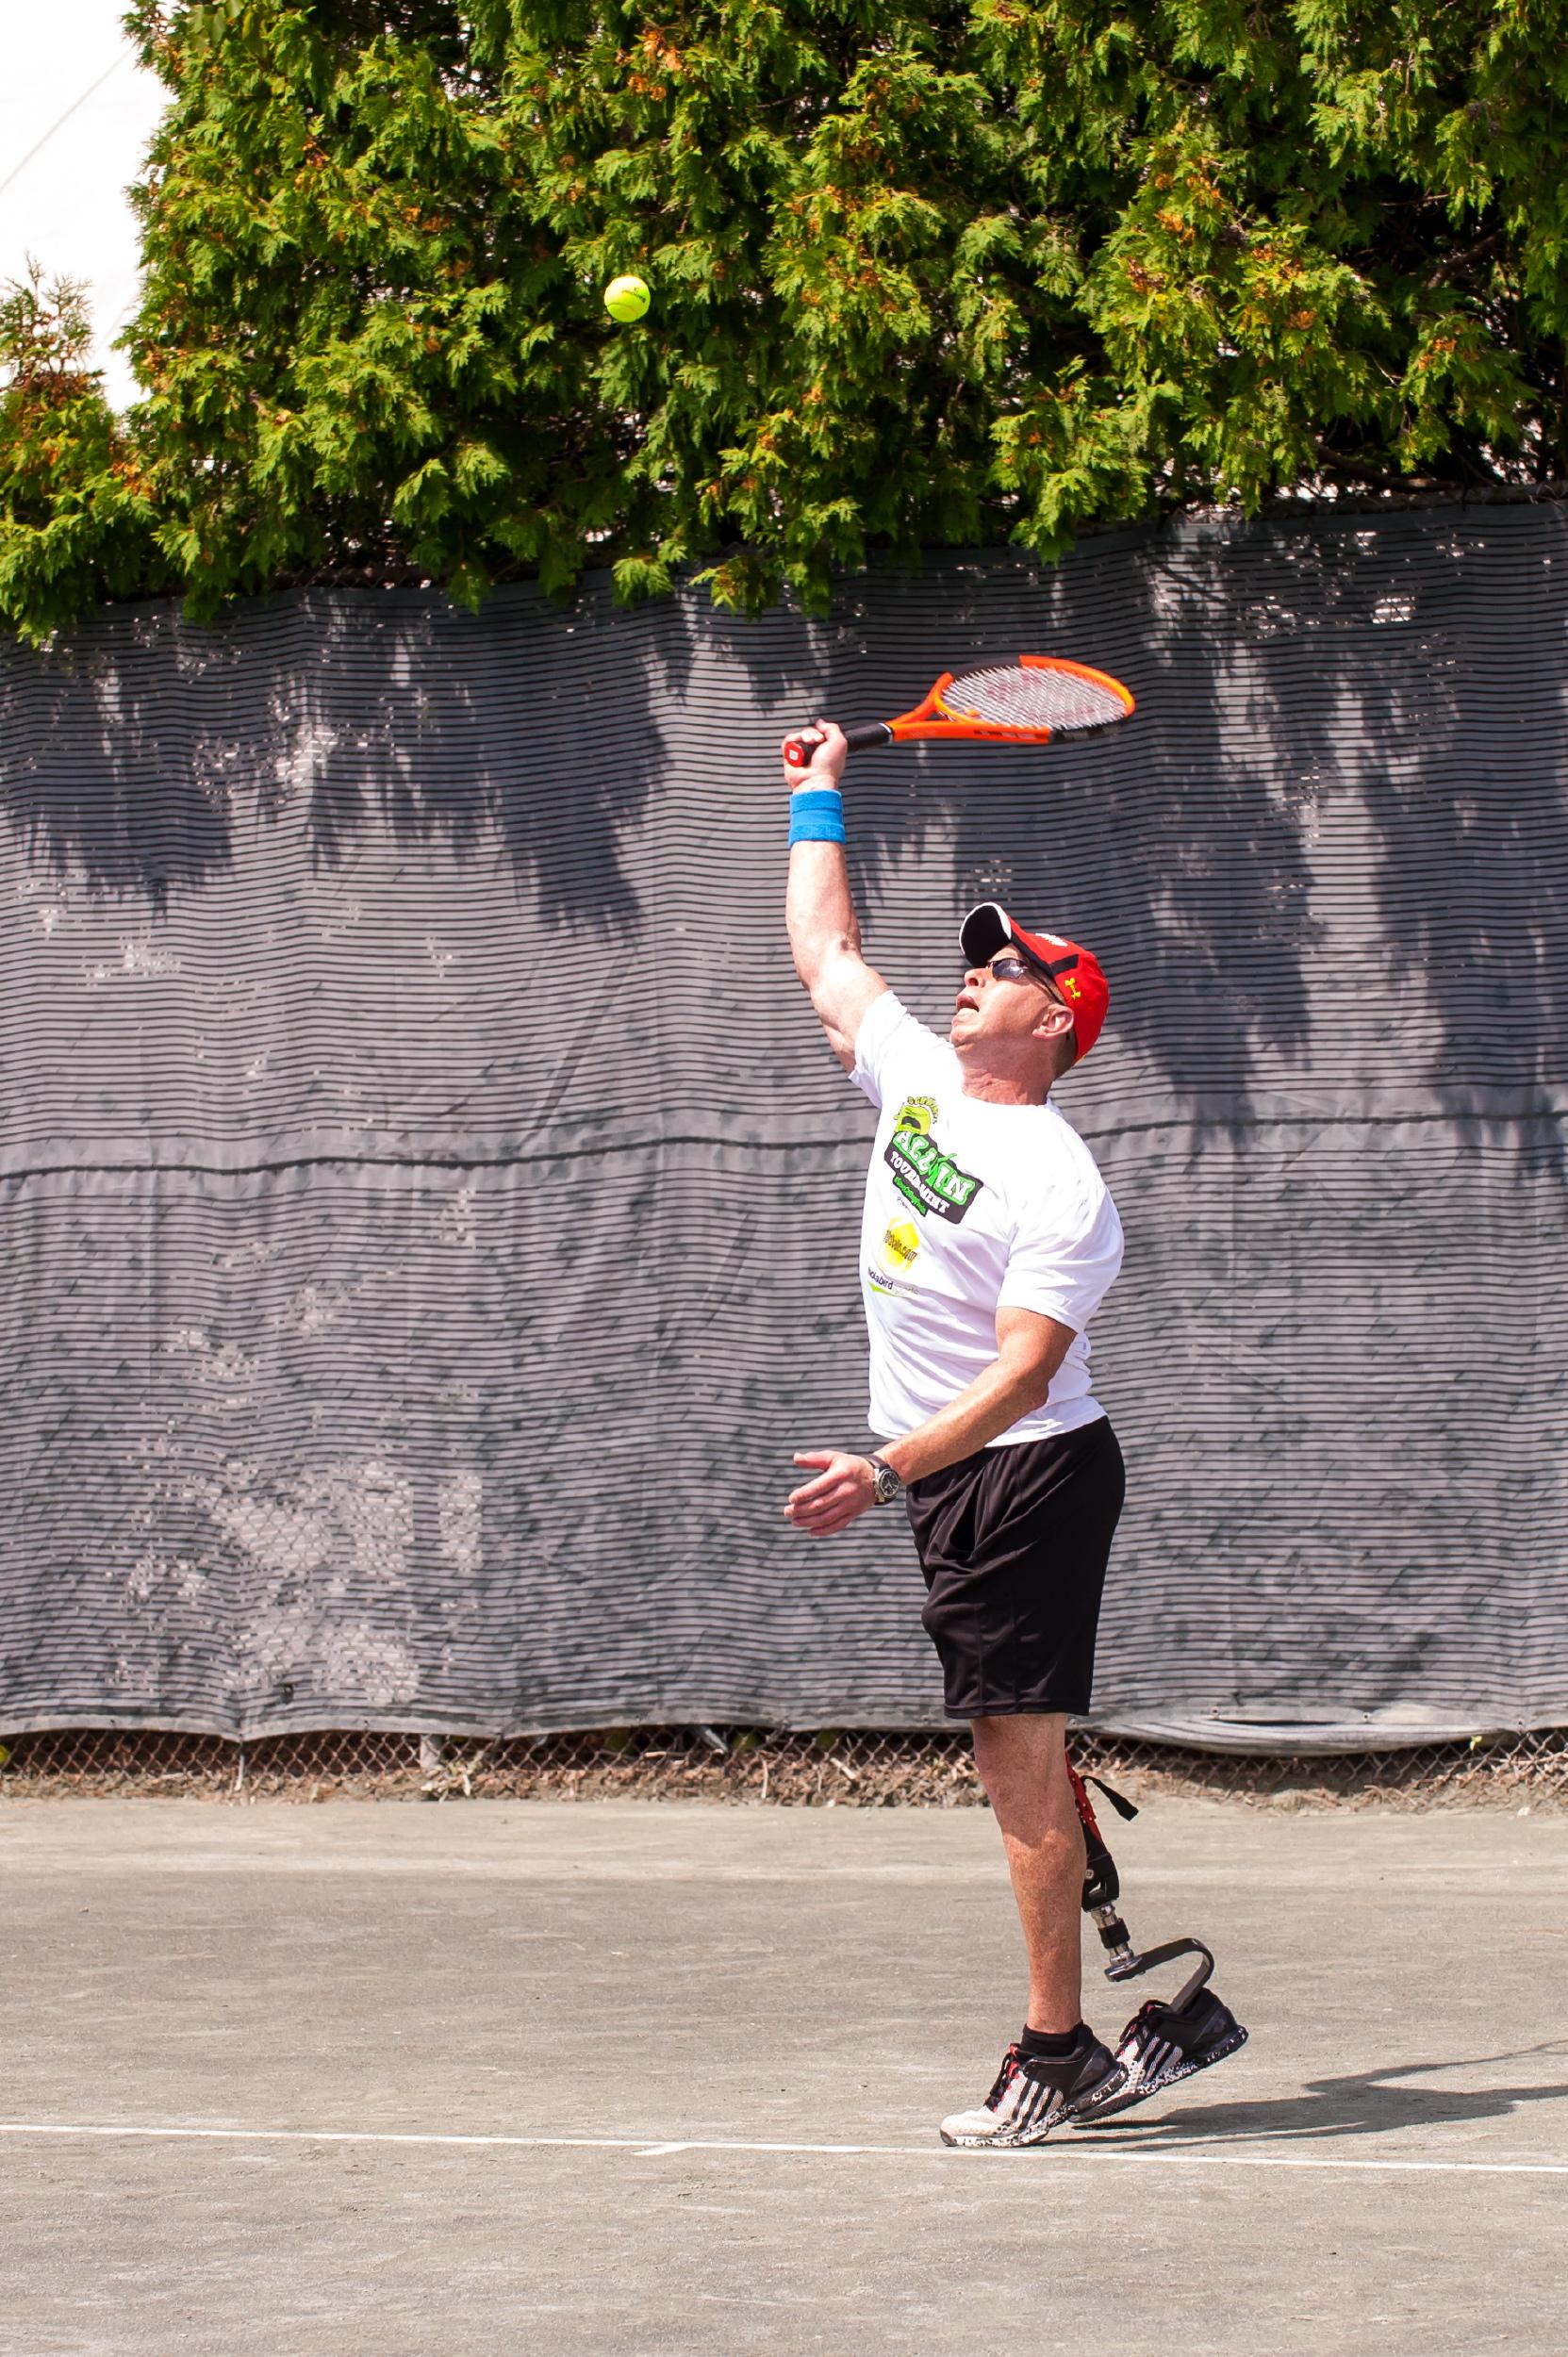 Richard's Tennis Shots